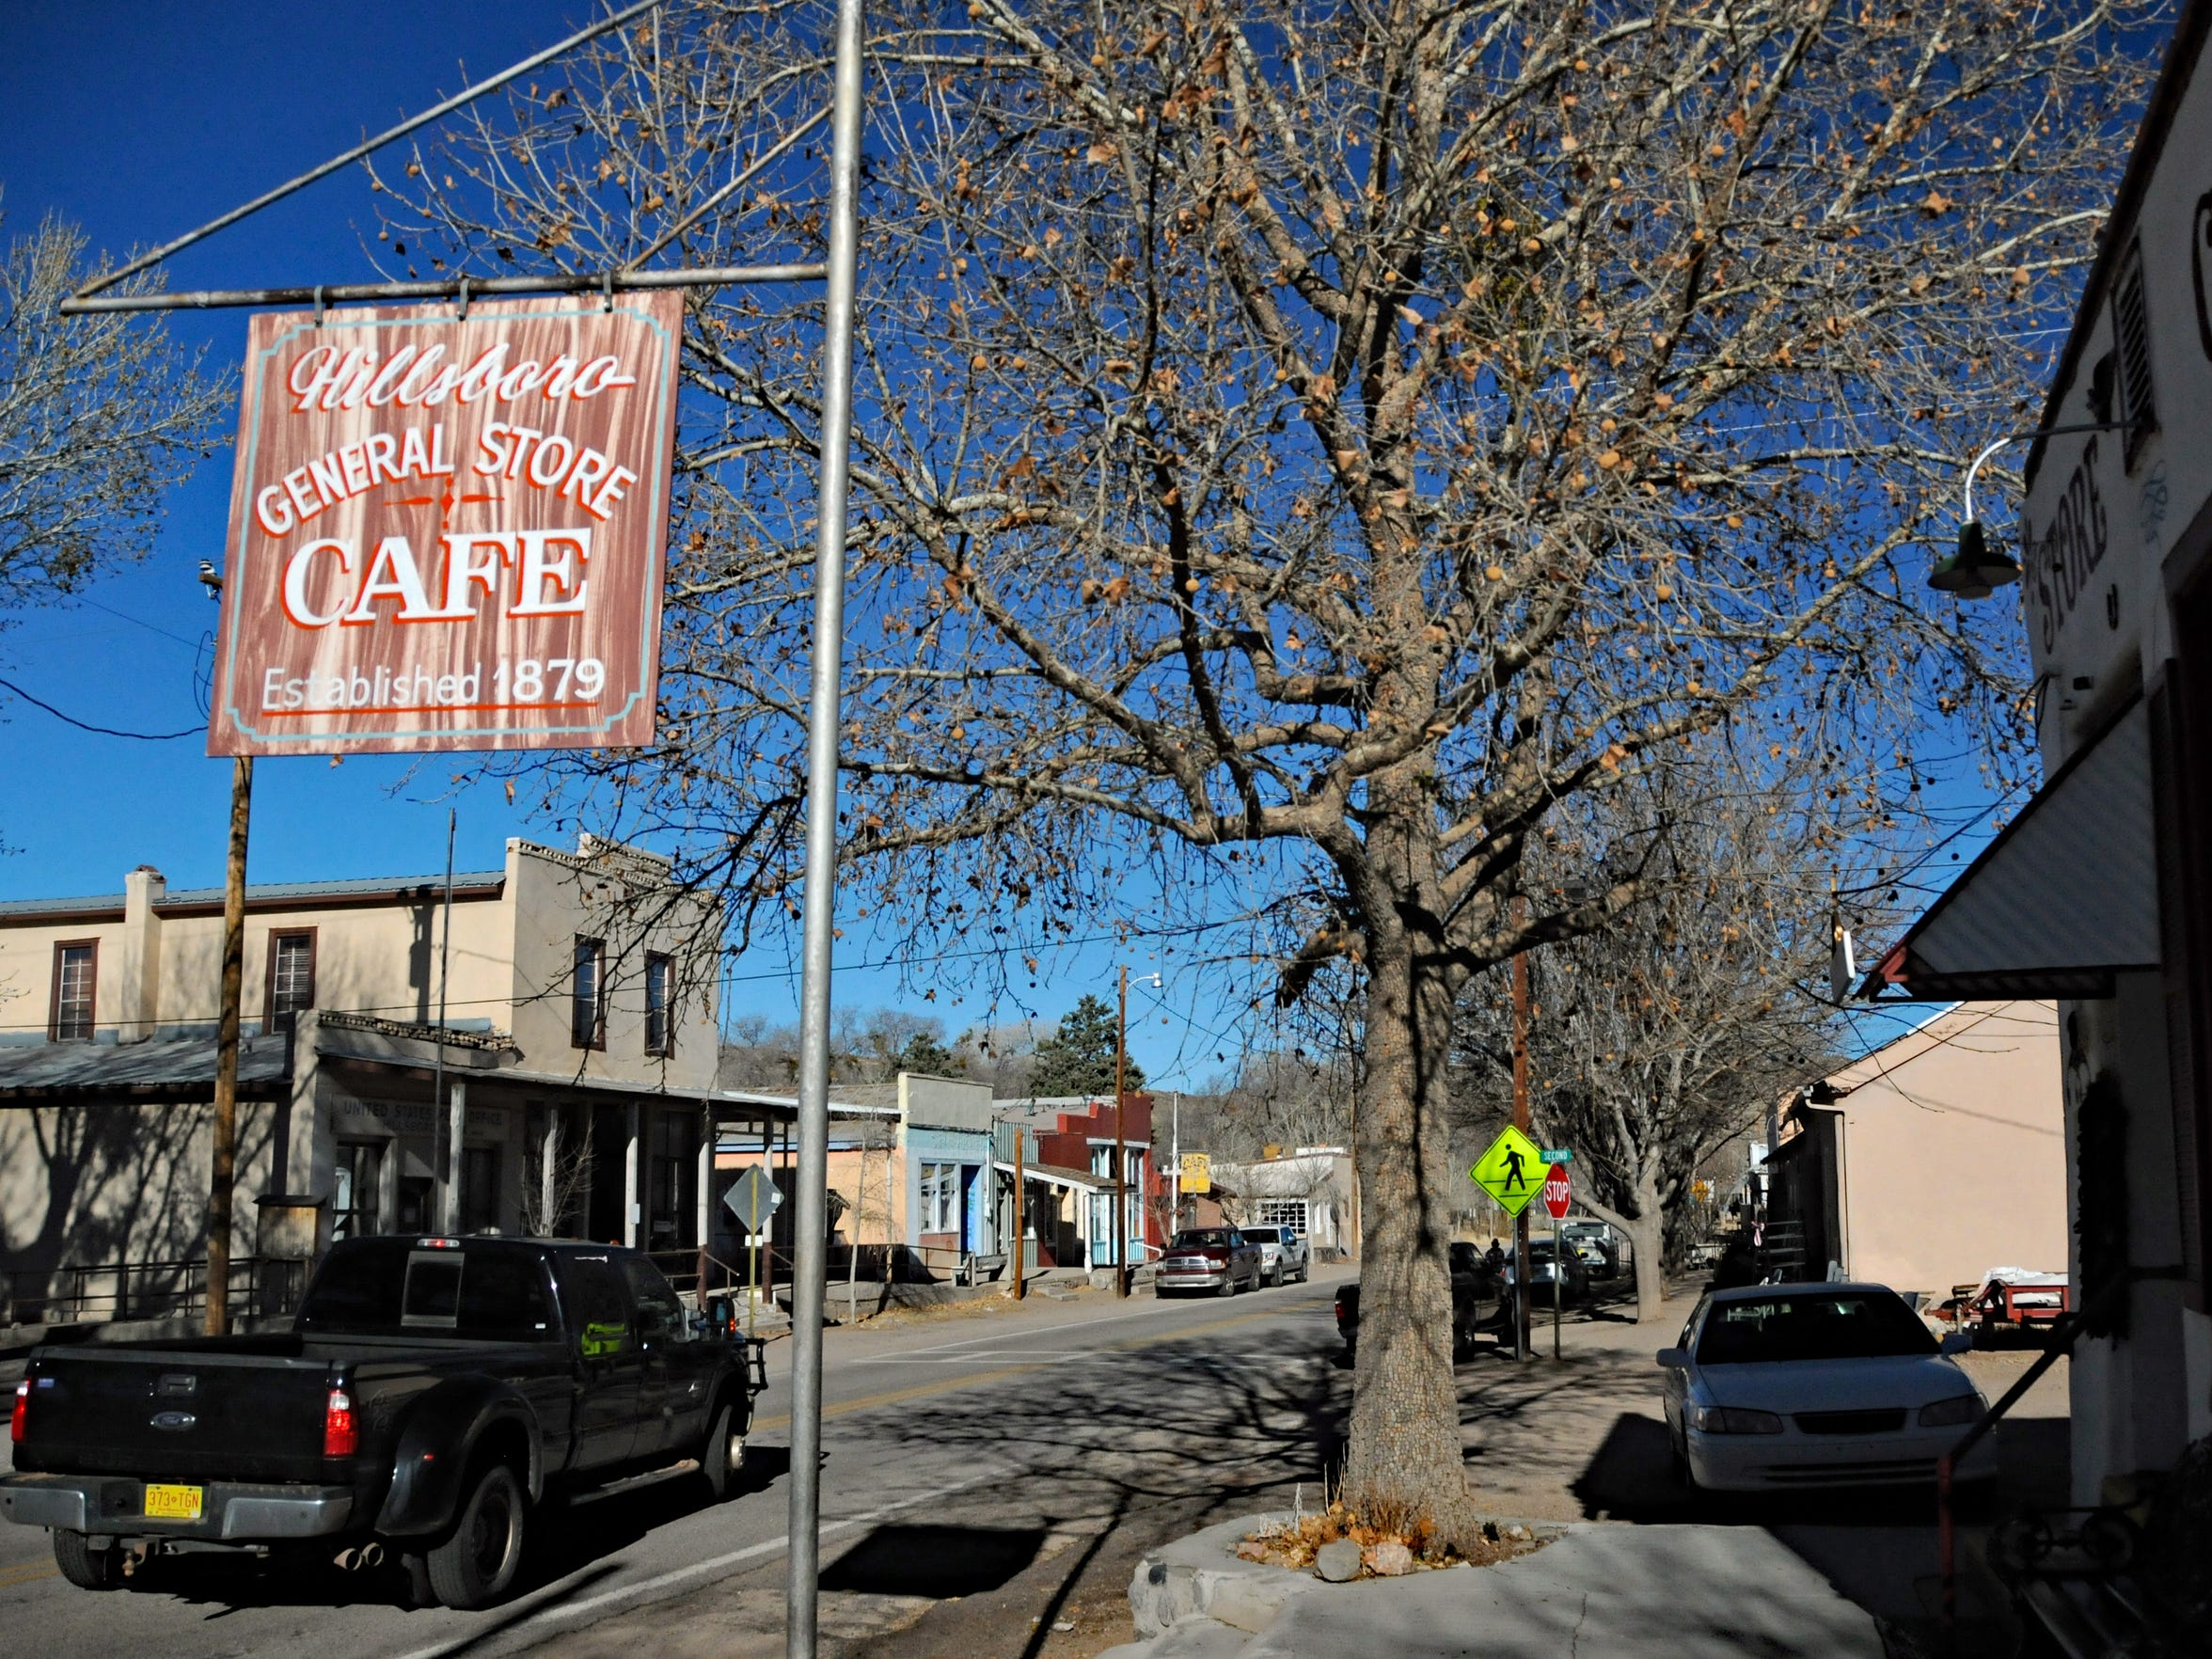 A view of the main street through Hillsboro, state